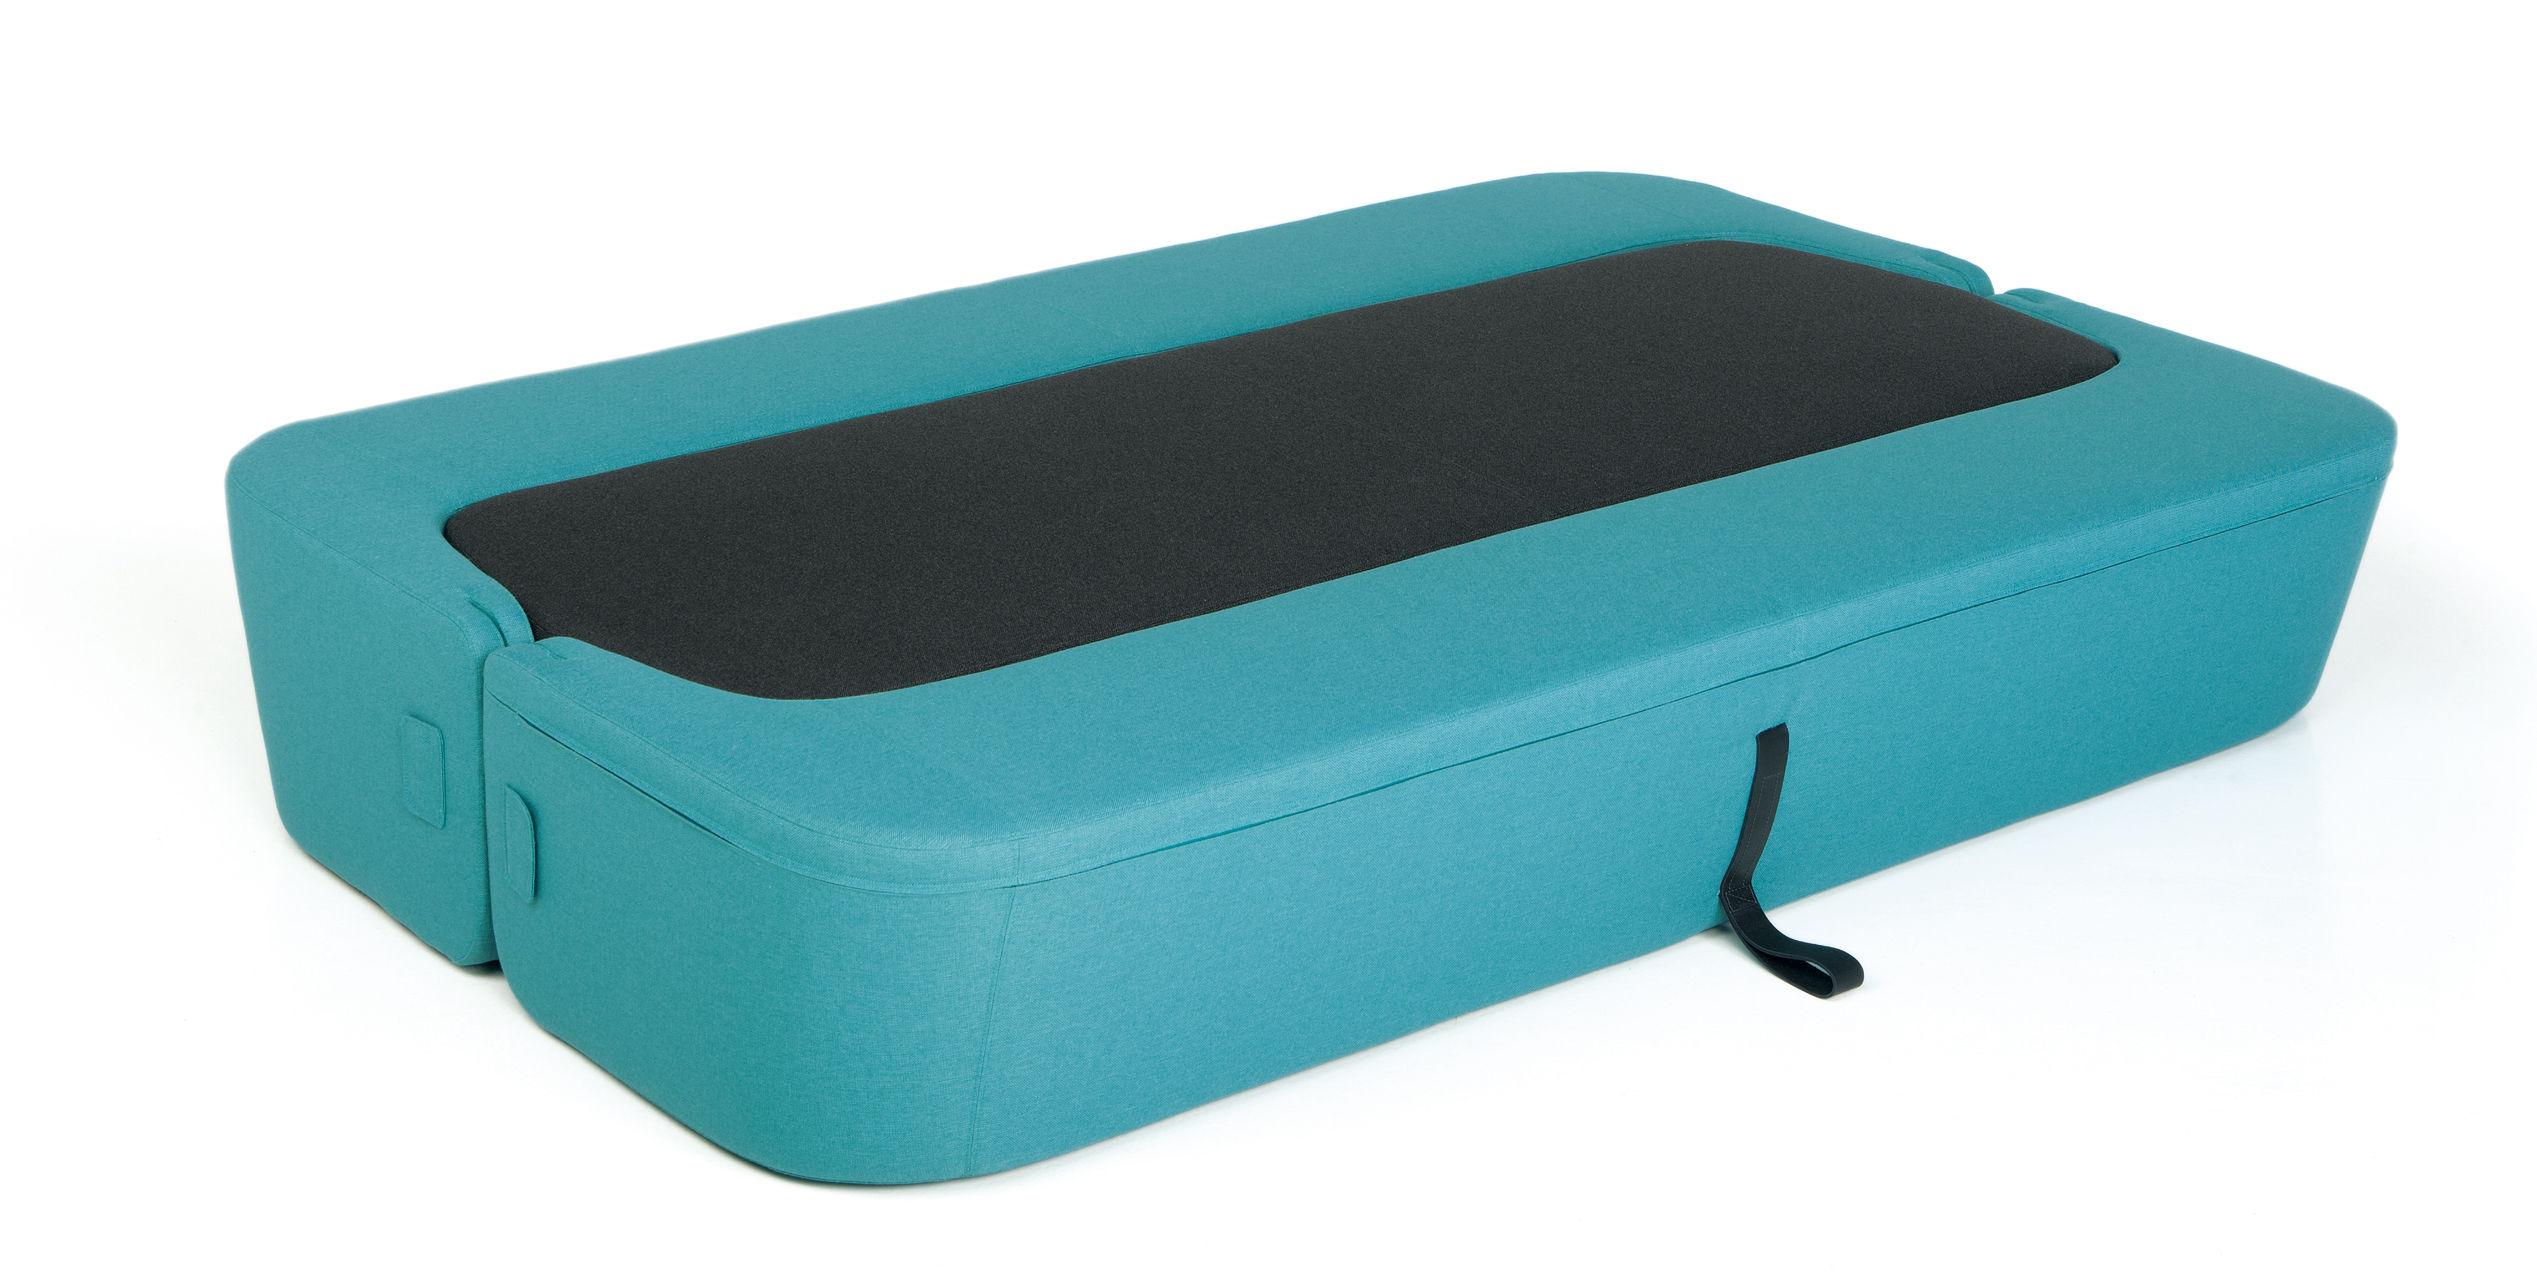 canap convertible revolve 3 places l 210 cm turquoise assise anthracite prostoria ltd. Black Bedroom Furniture Sets. Home Design Ideas